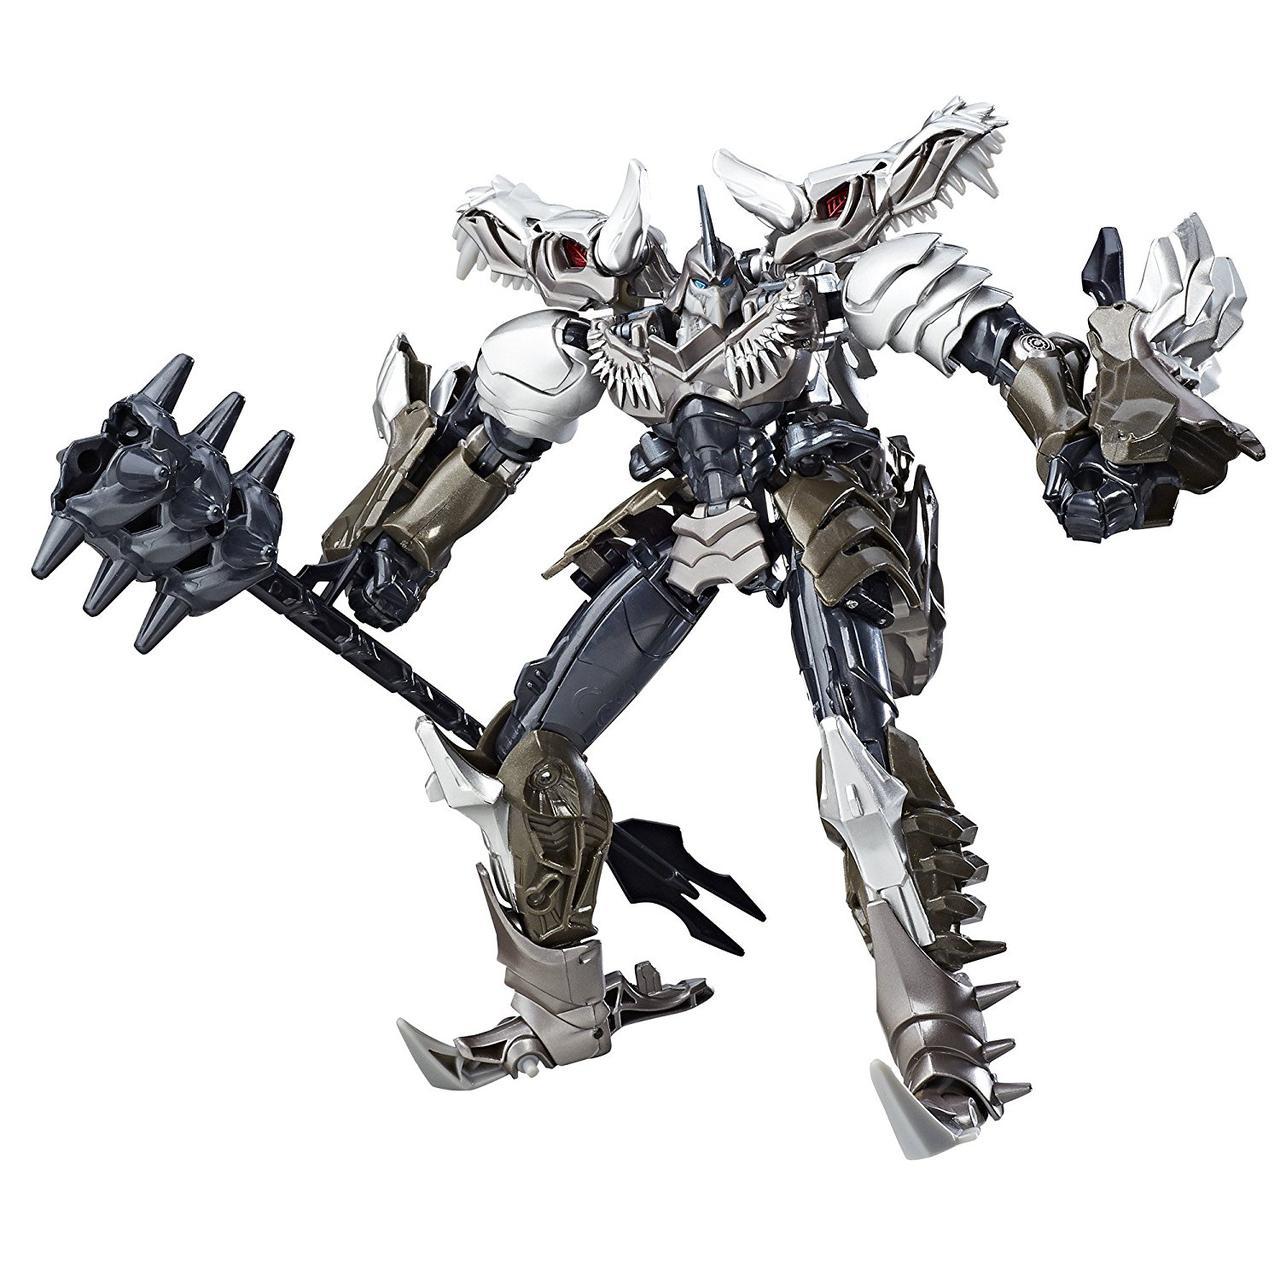 Трансформеры 5: Гримлок последний рыцарь,Transformers: The Last Knight Premier Edition Voyager Class Grimlock